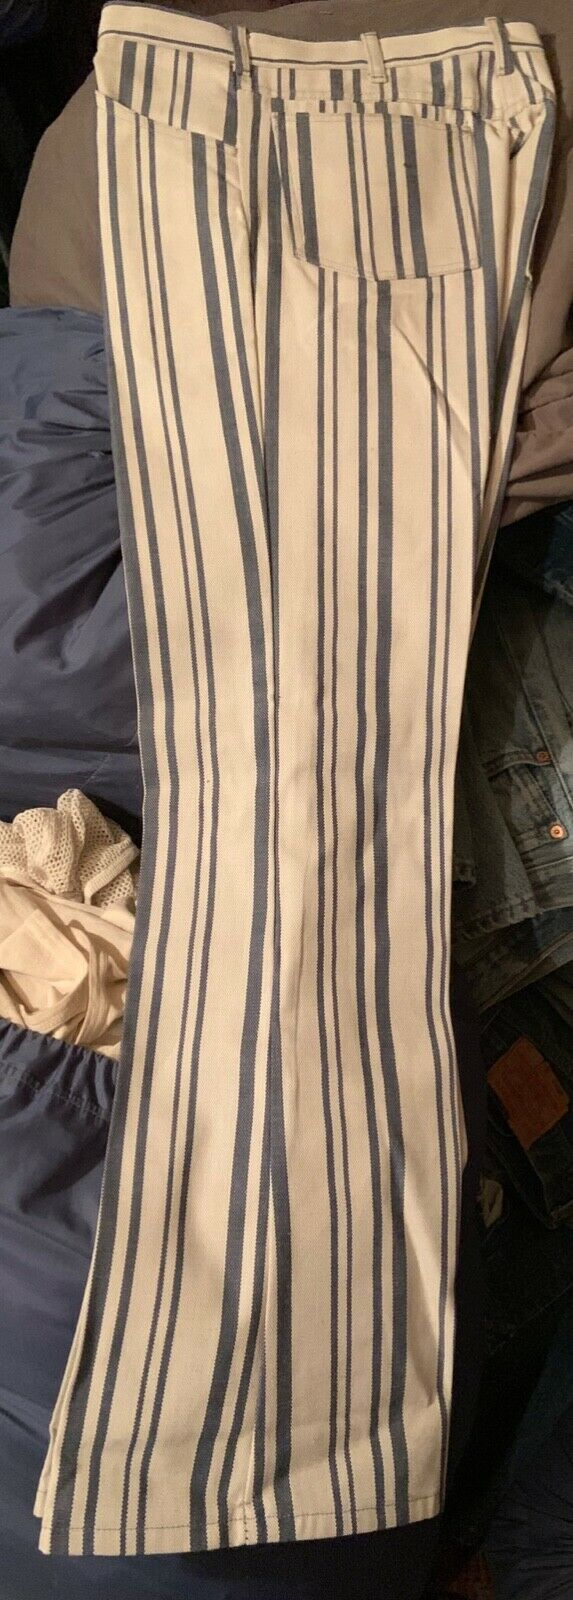 "NOS Jeans Size 29-30""Waist x 42"" Length"